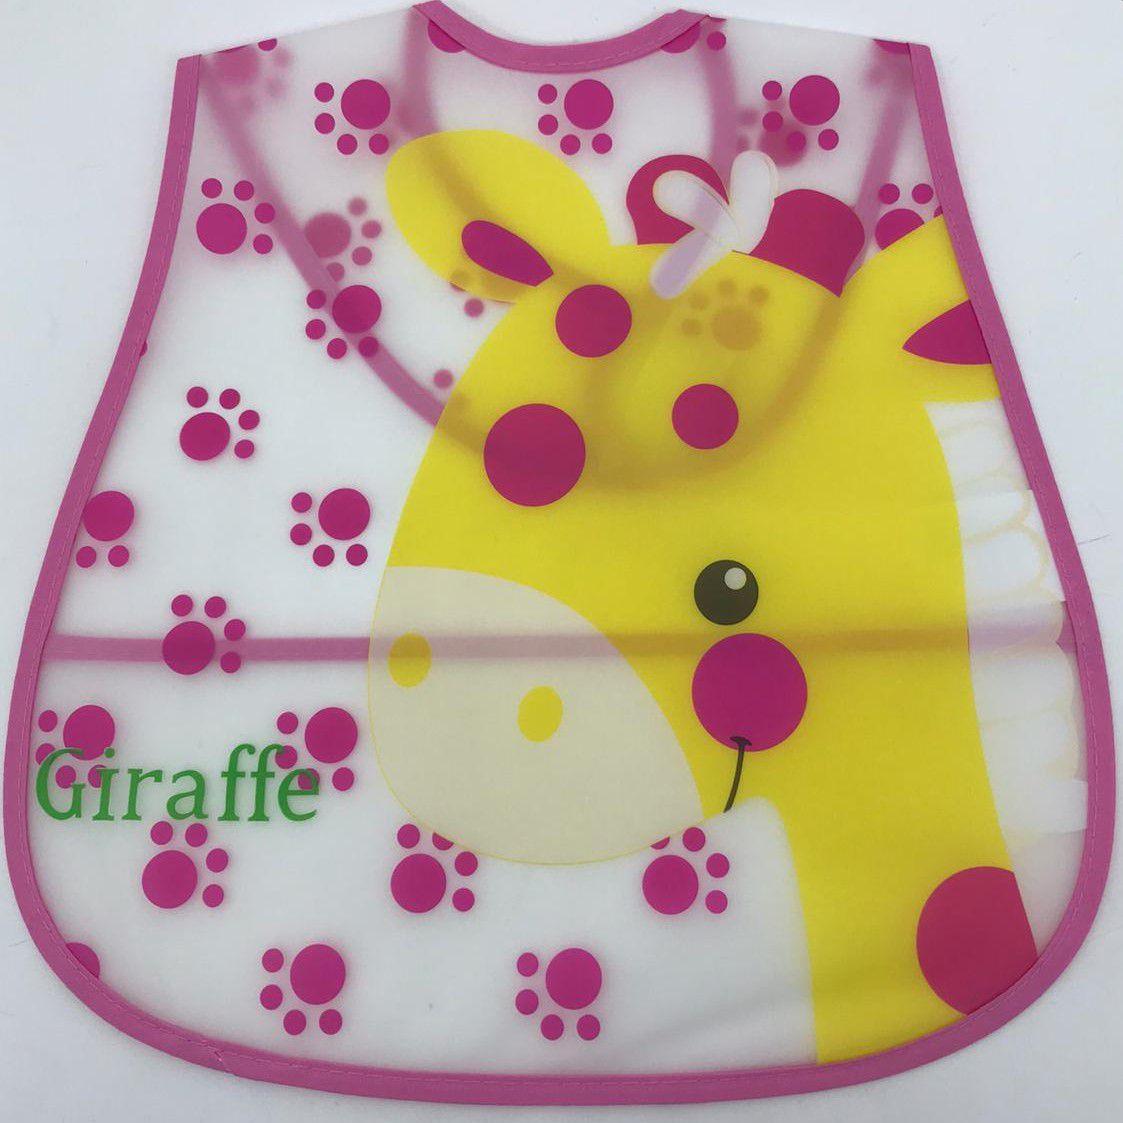 Avental infantil Girafa Novo Século